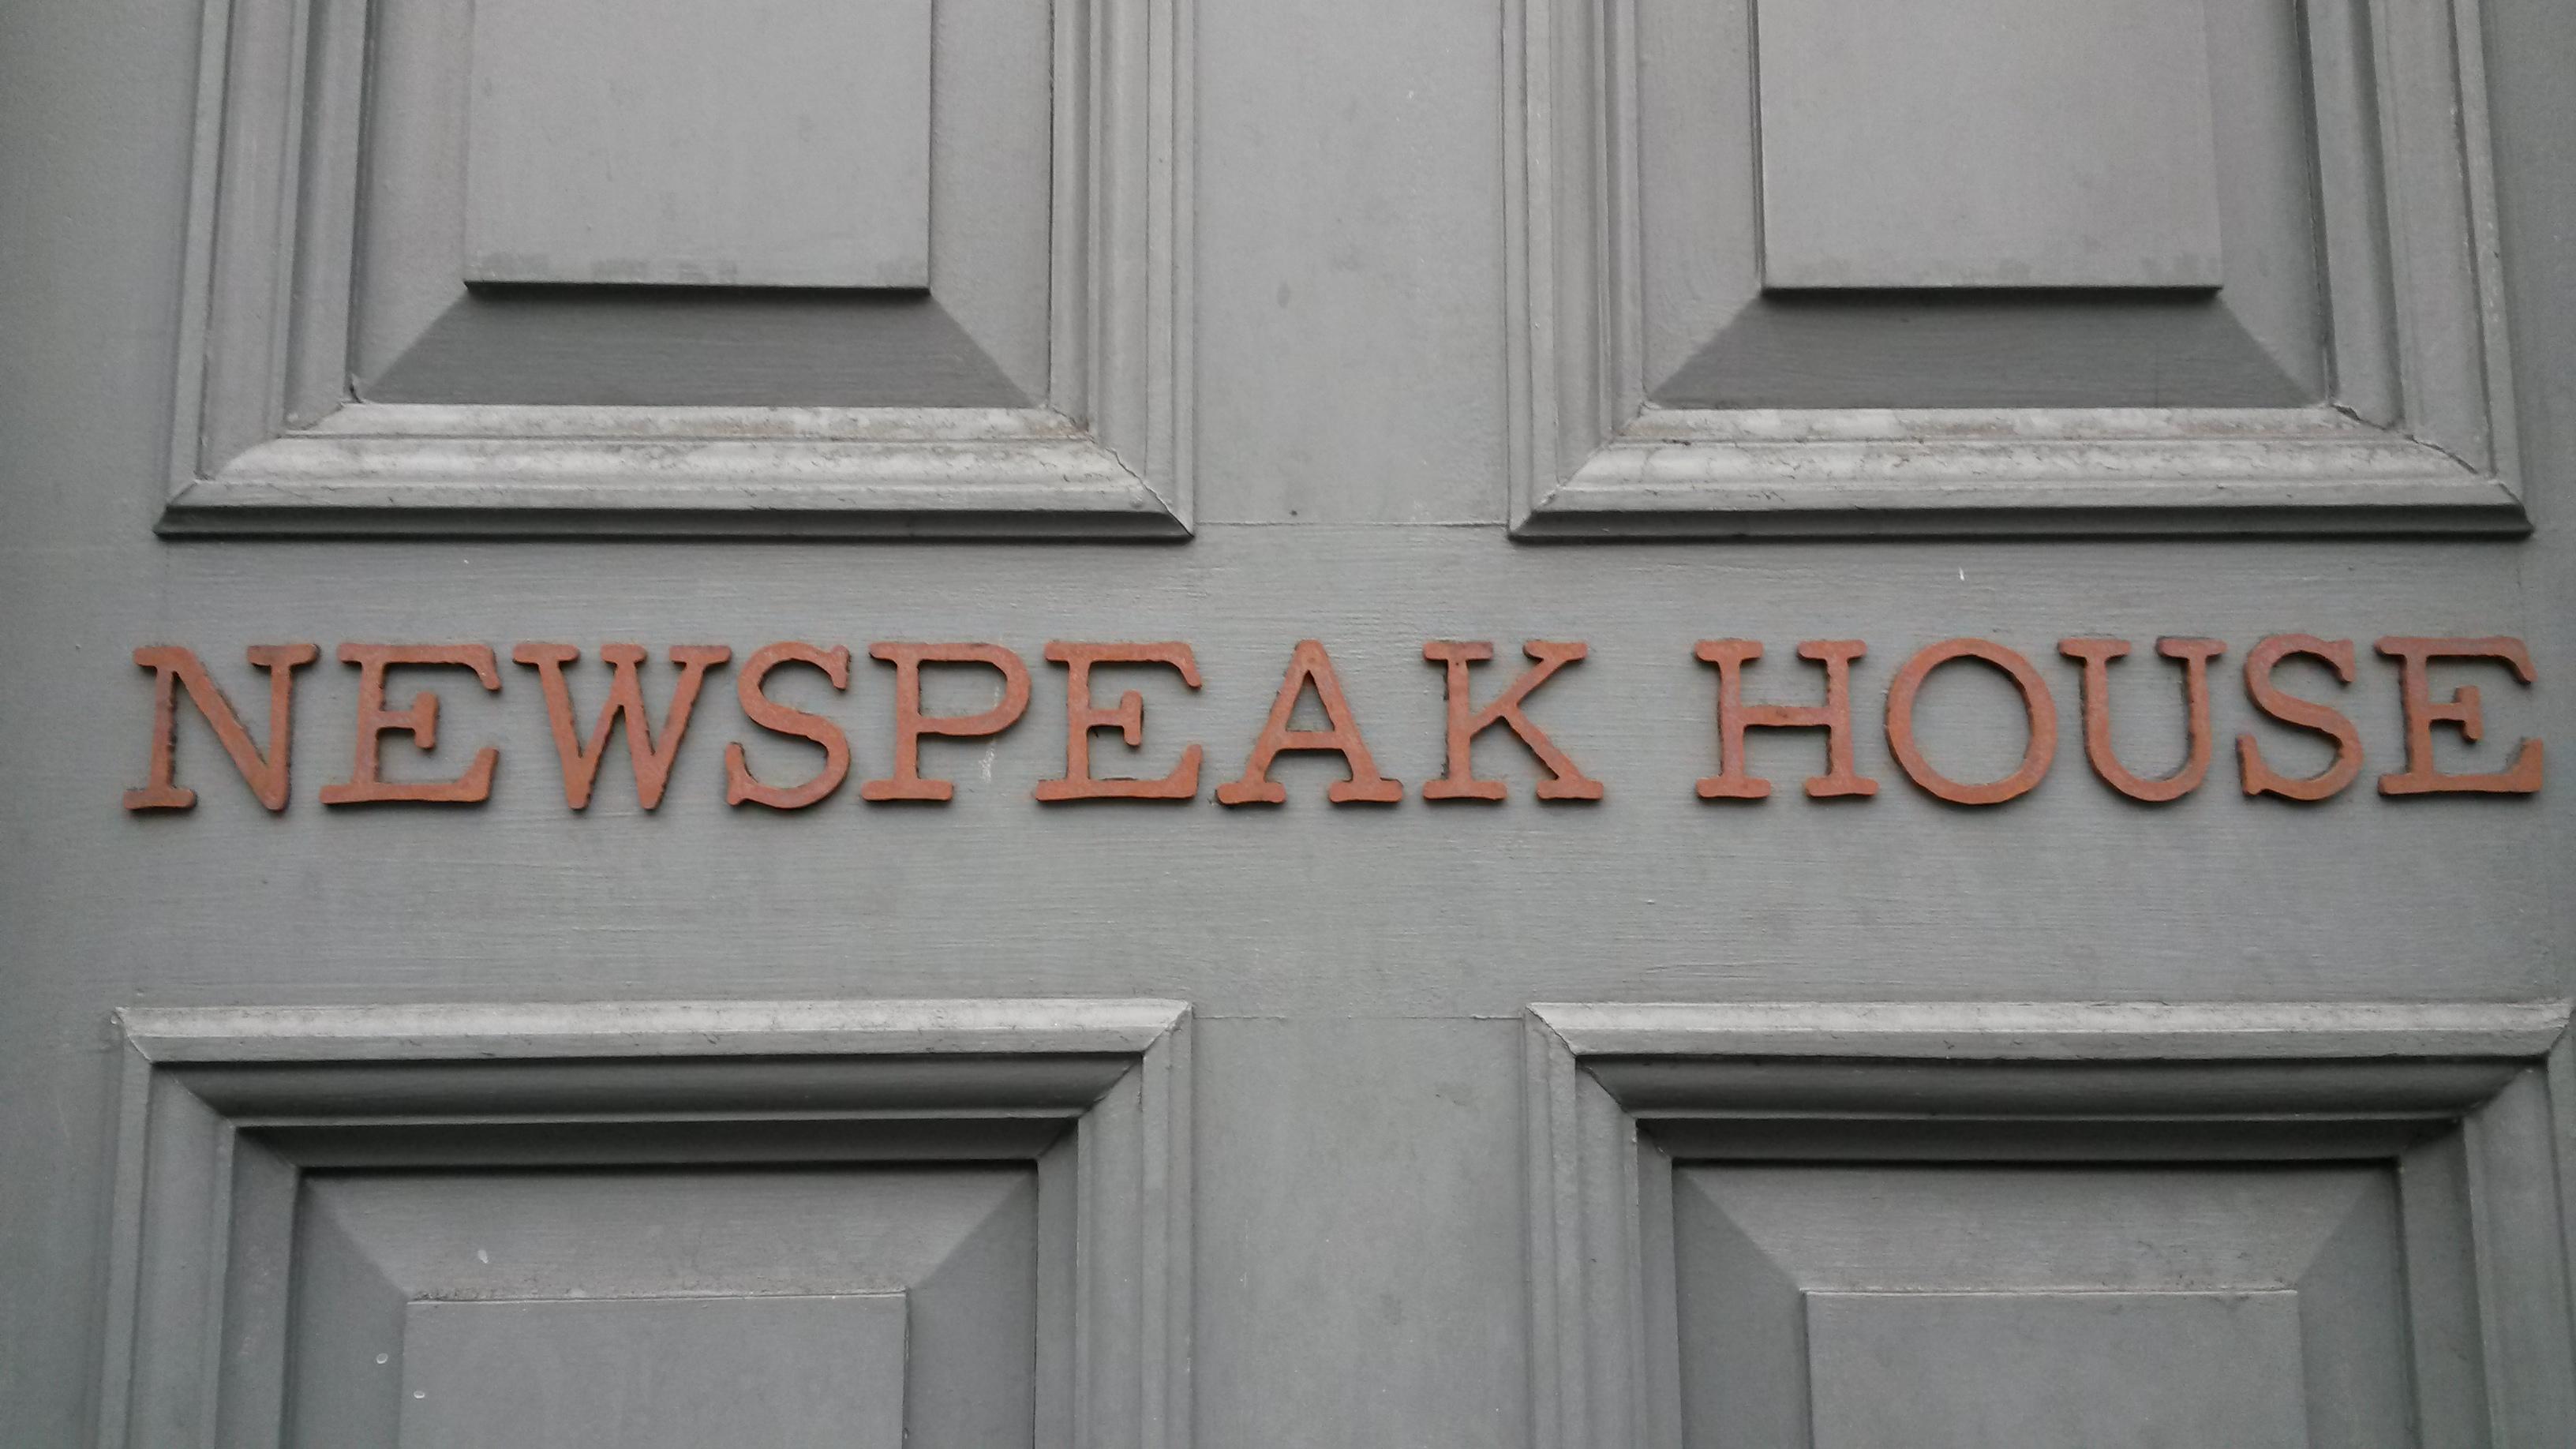 Newspeak House in London